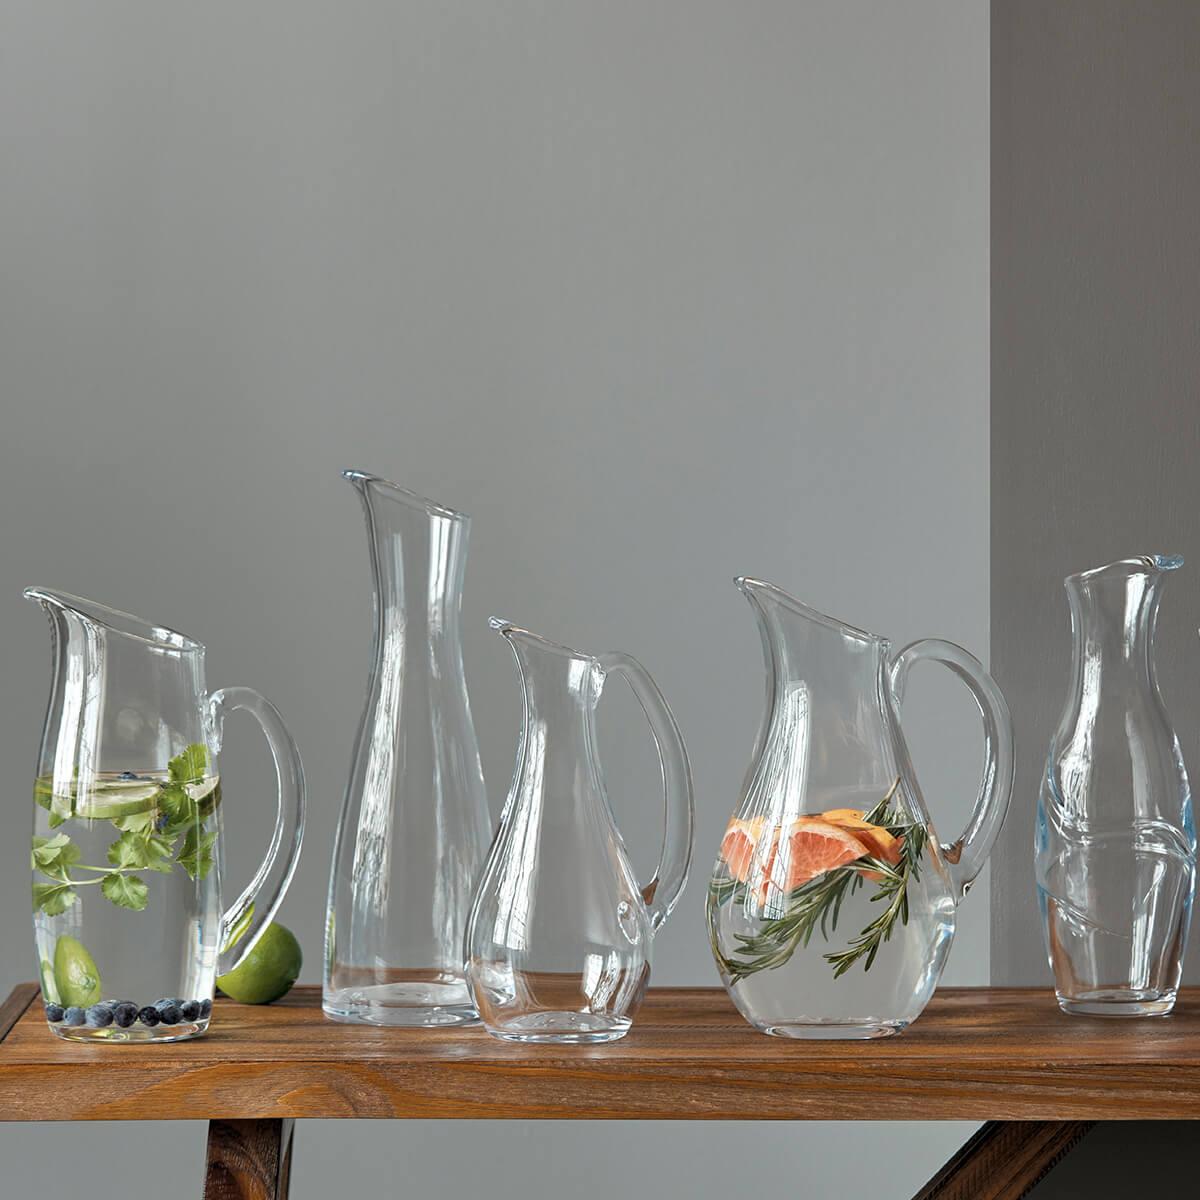 Assortment of pitchers